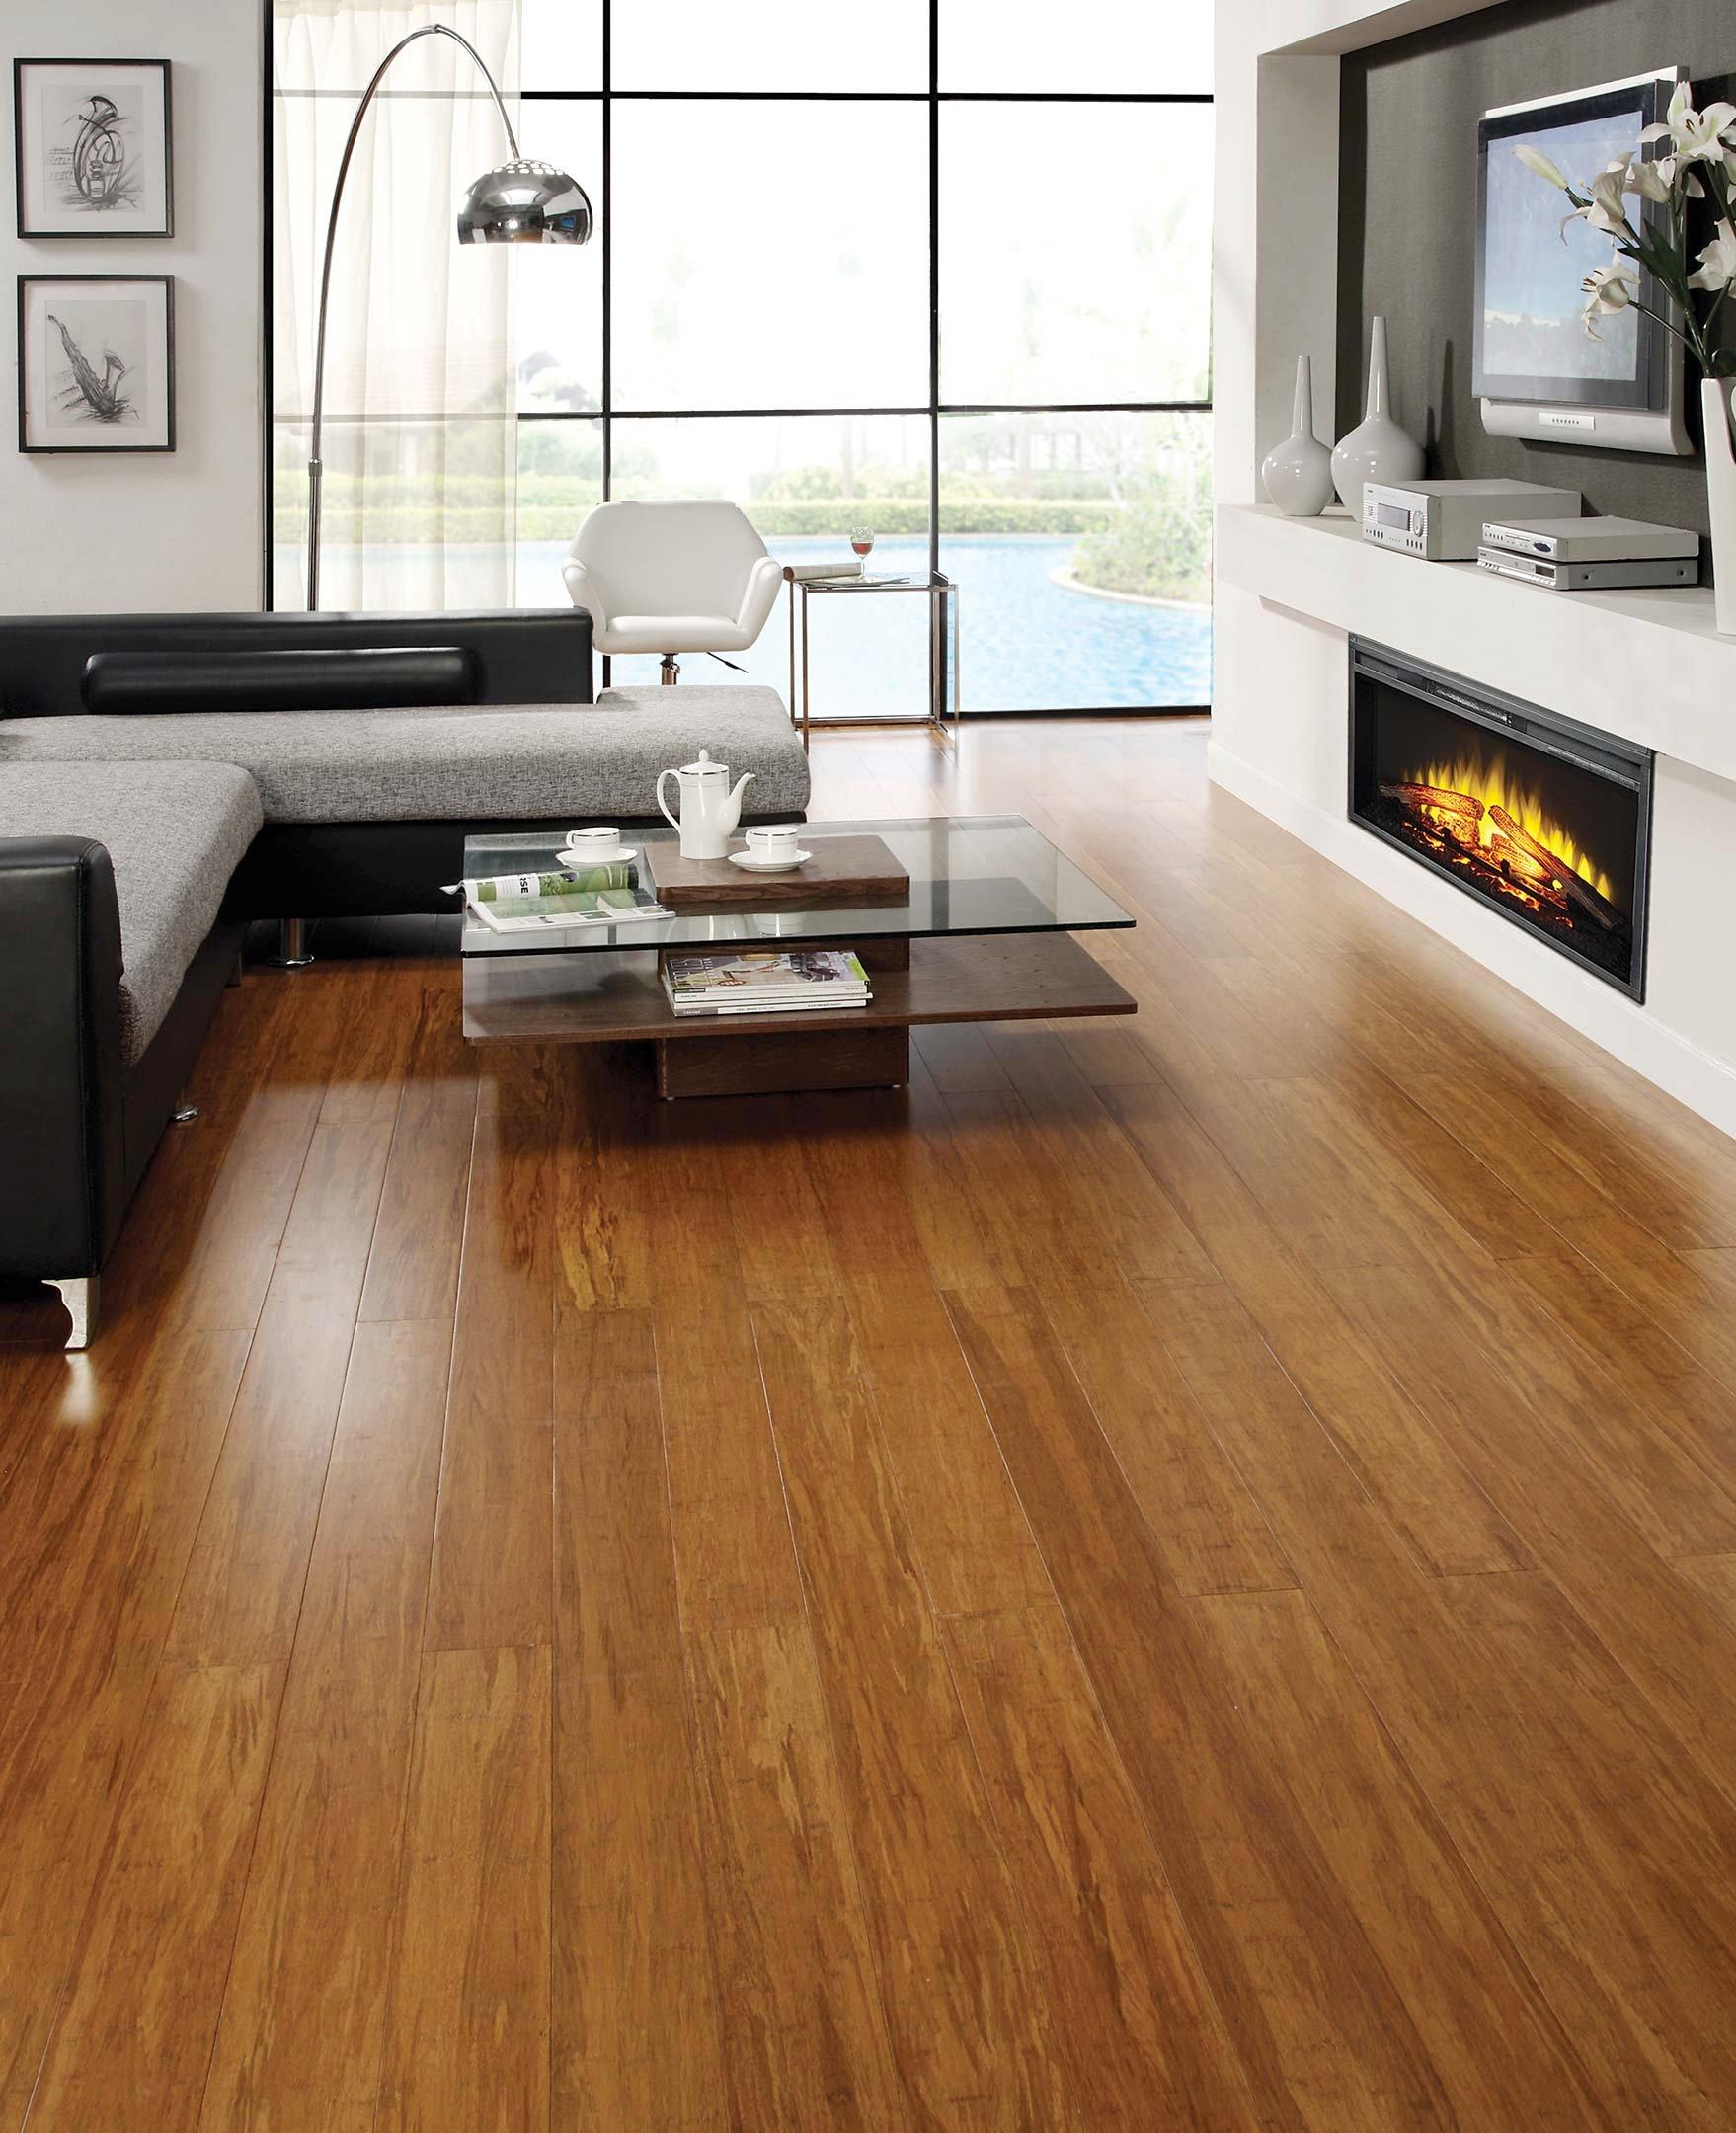 bamboo floor tiles photo 1 of 8 strand woven bamboo flooring (nice bamboo floor tile #1) PTPTAOX